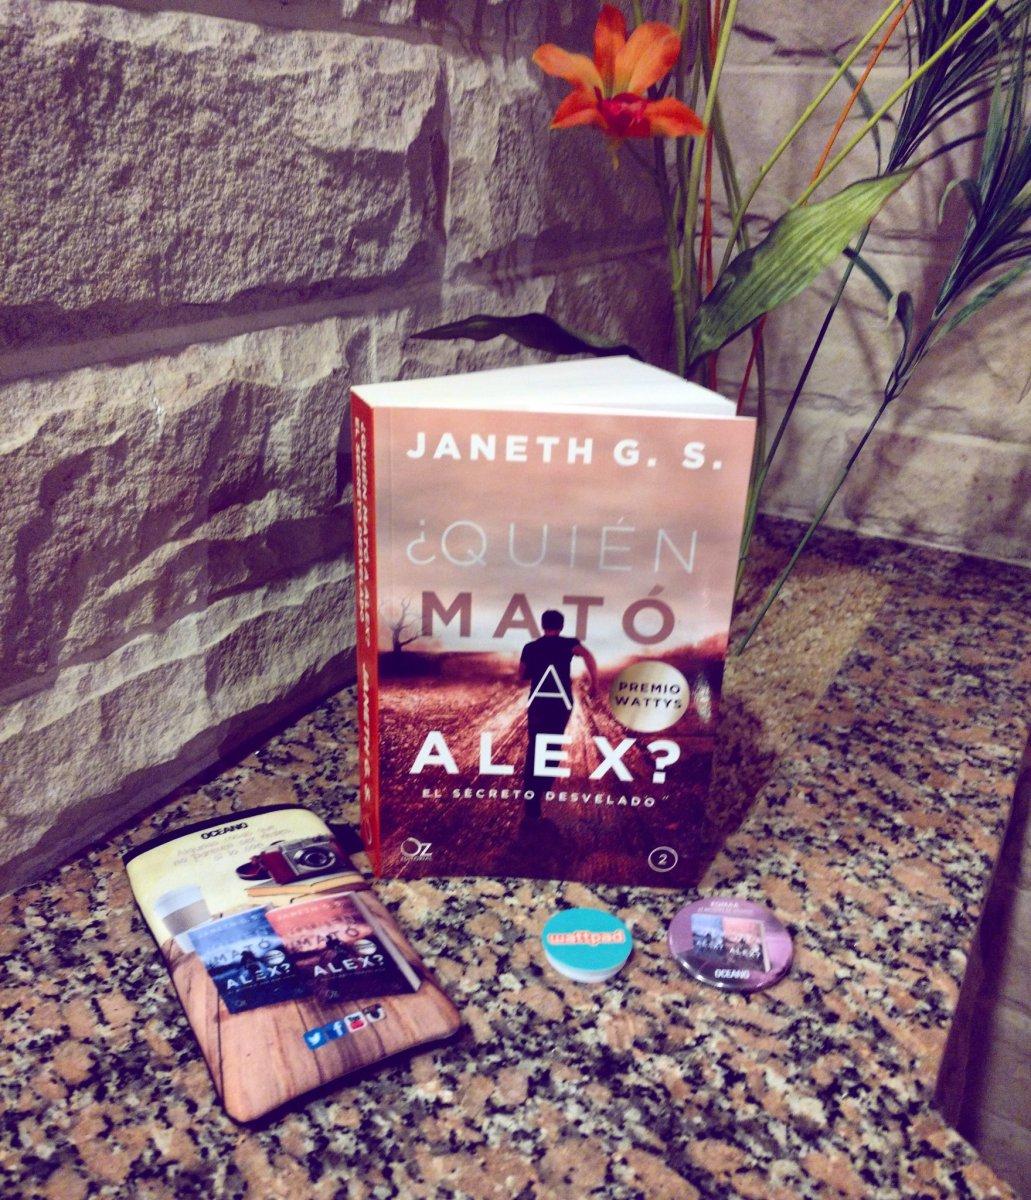 Quién mató a Alex, el misterio desvelado